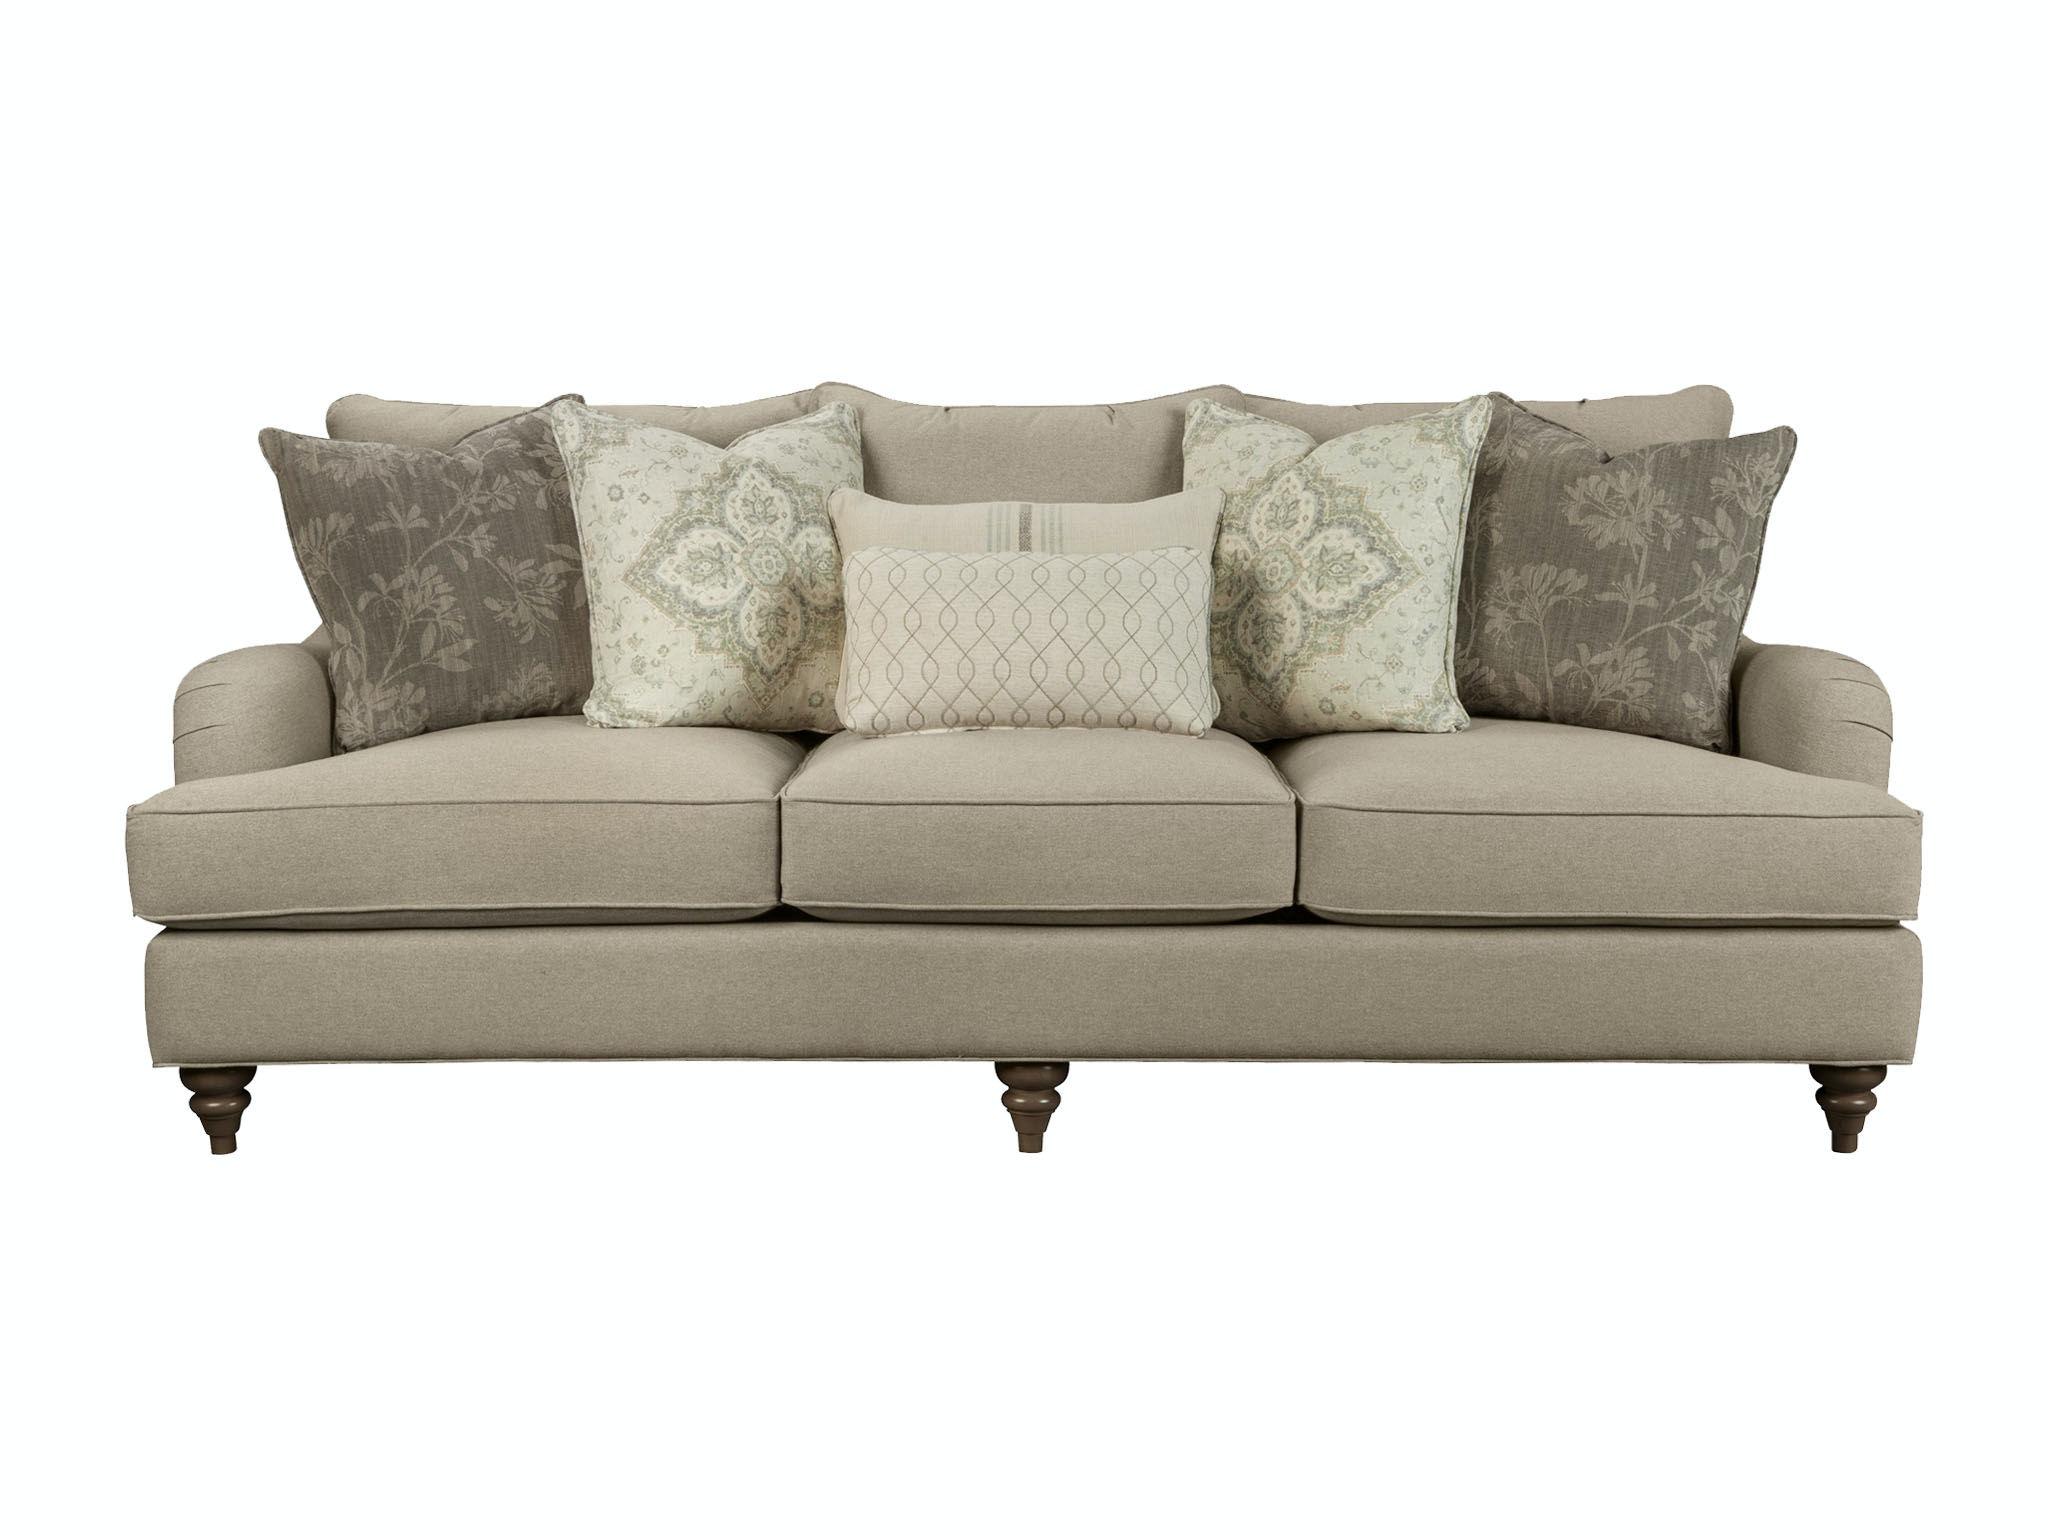 Paula Deen By Craftmaster Living Room Sofa P773654bd Great Deals